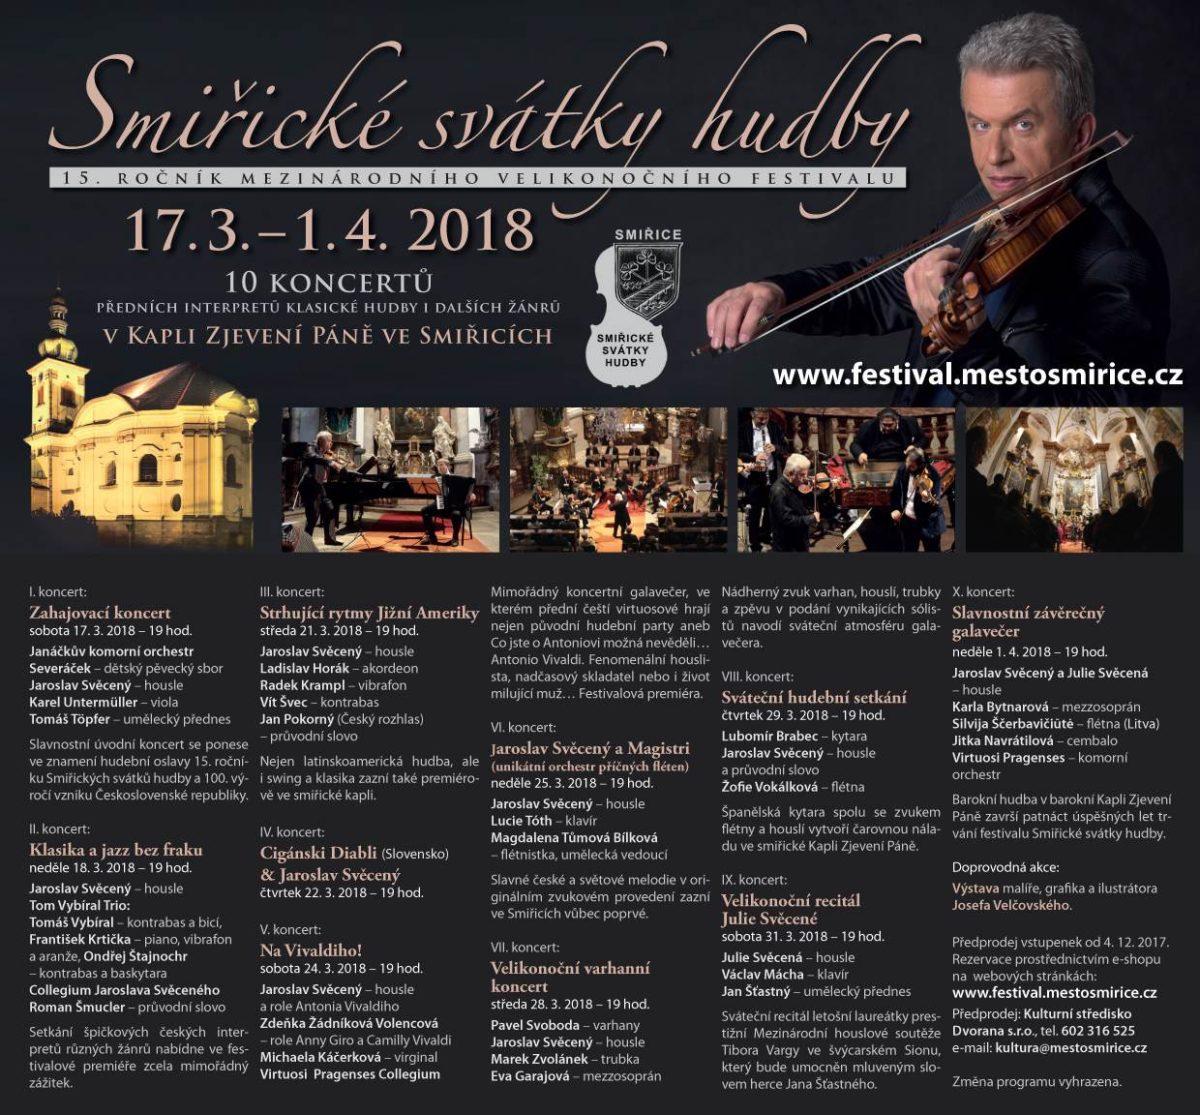 15.ročník festivalu Smiřické svátky hudby